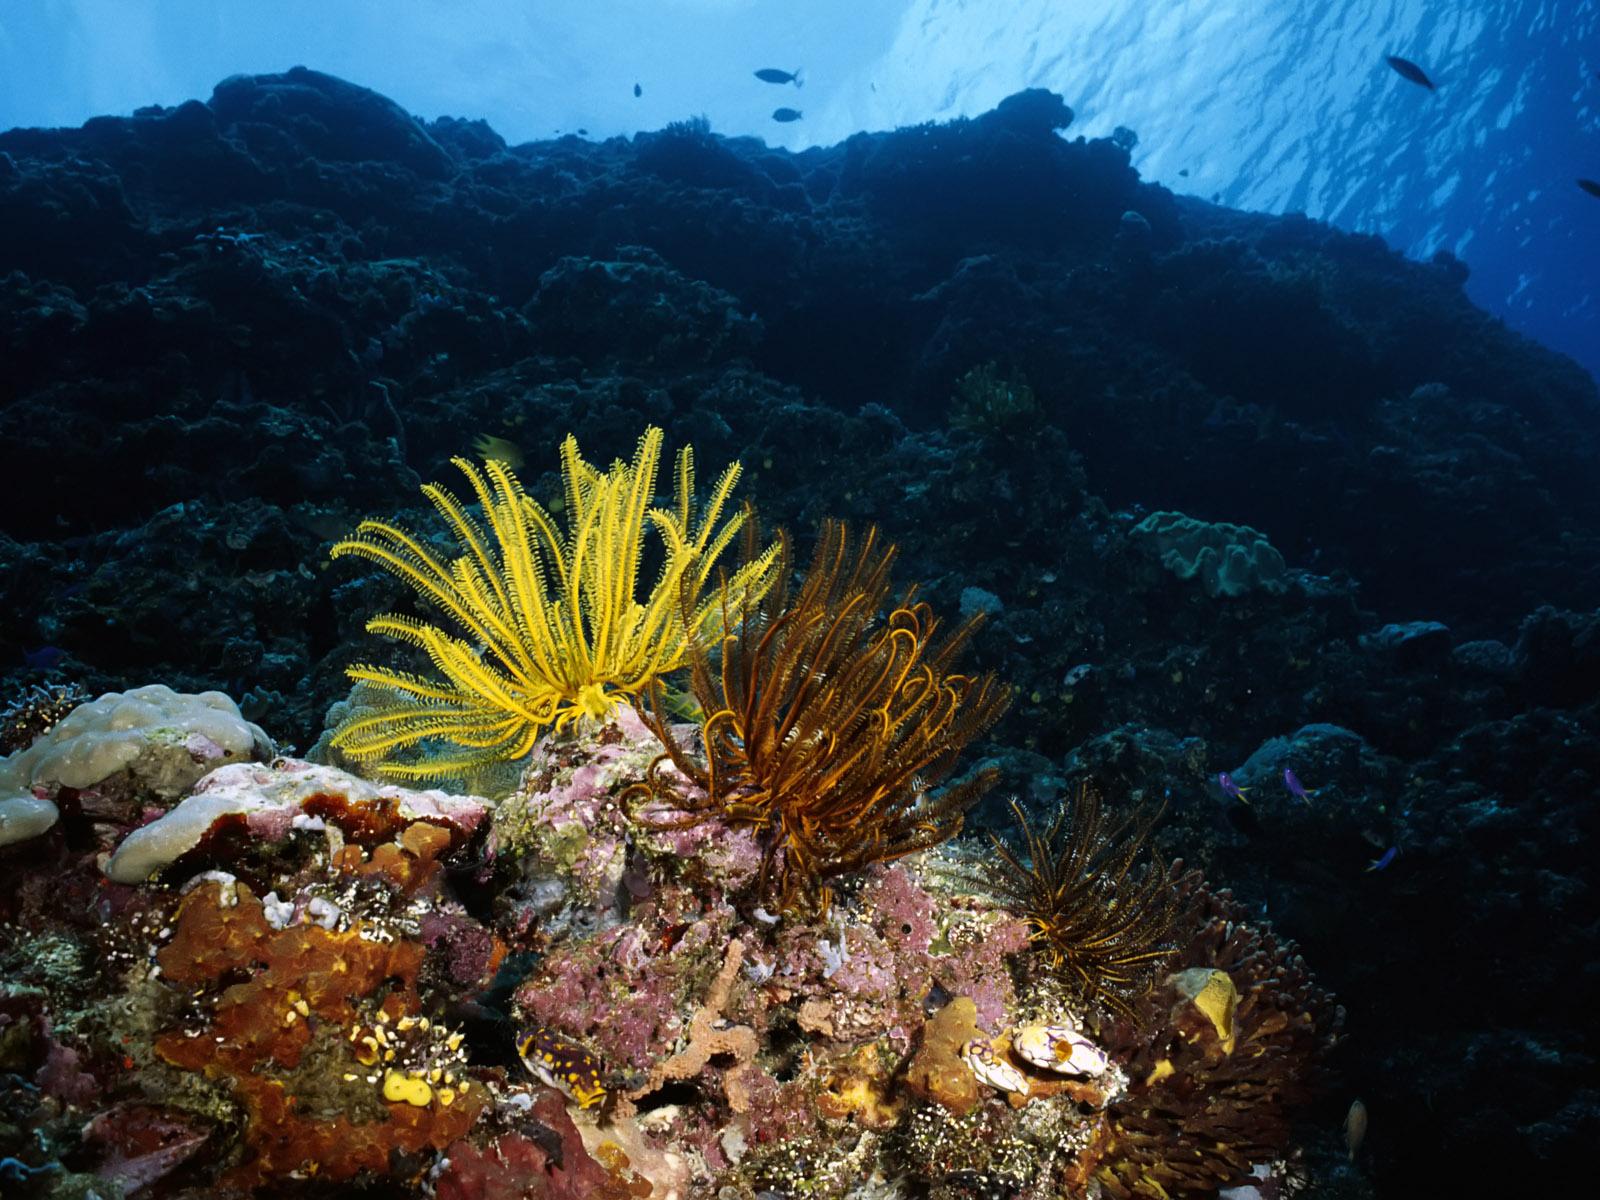 http://2.bp.blogspot.com/-2eVDZjiiotM/Tg4q4dakdMI/AAAAAAAABAs/nt3YytrwoDo/s1600/Underwater%2BWallpaper%2B%25252890%252529.jpg